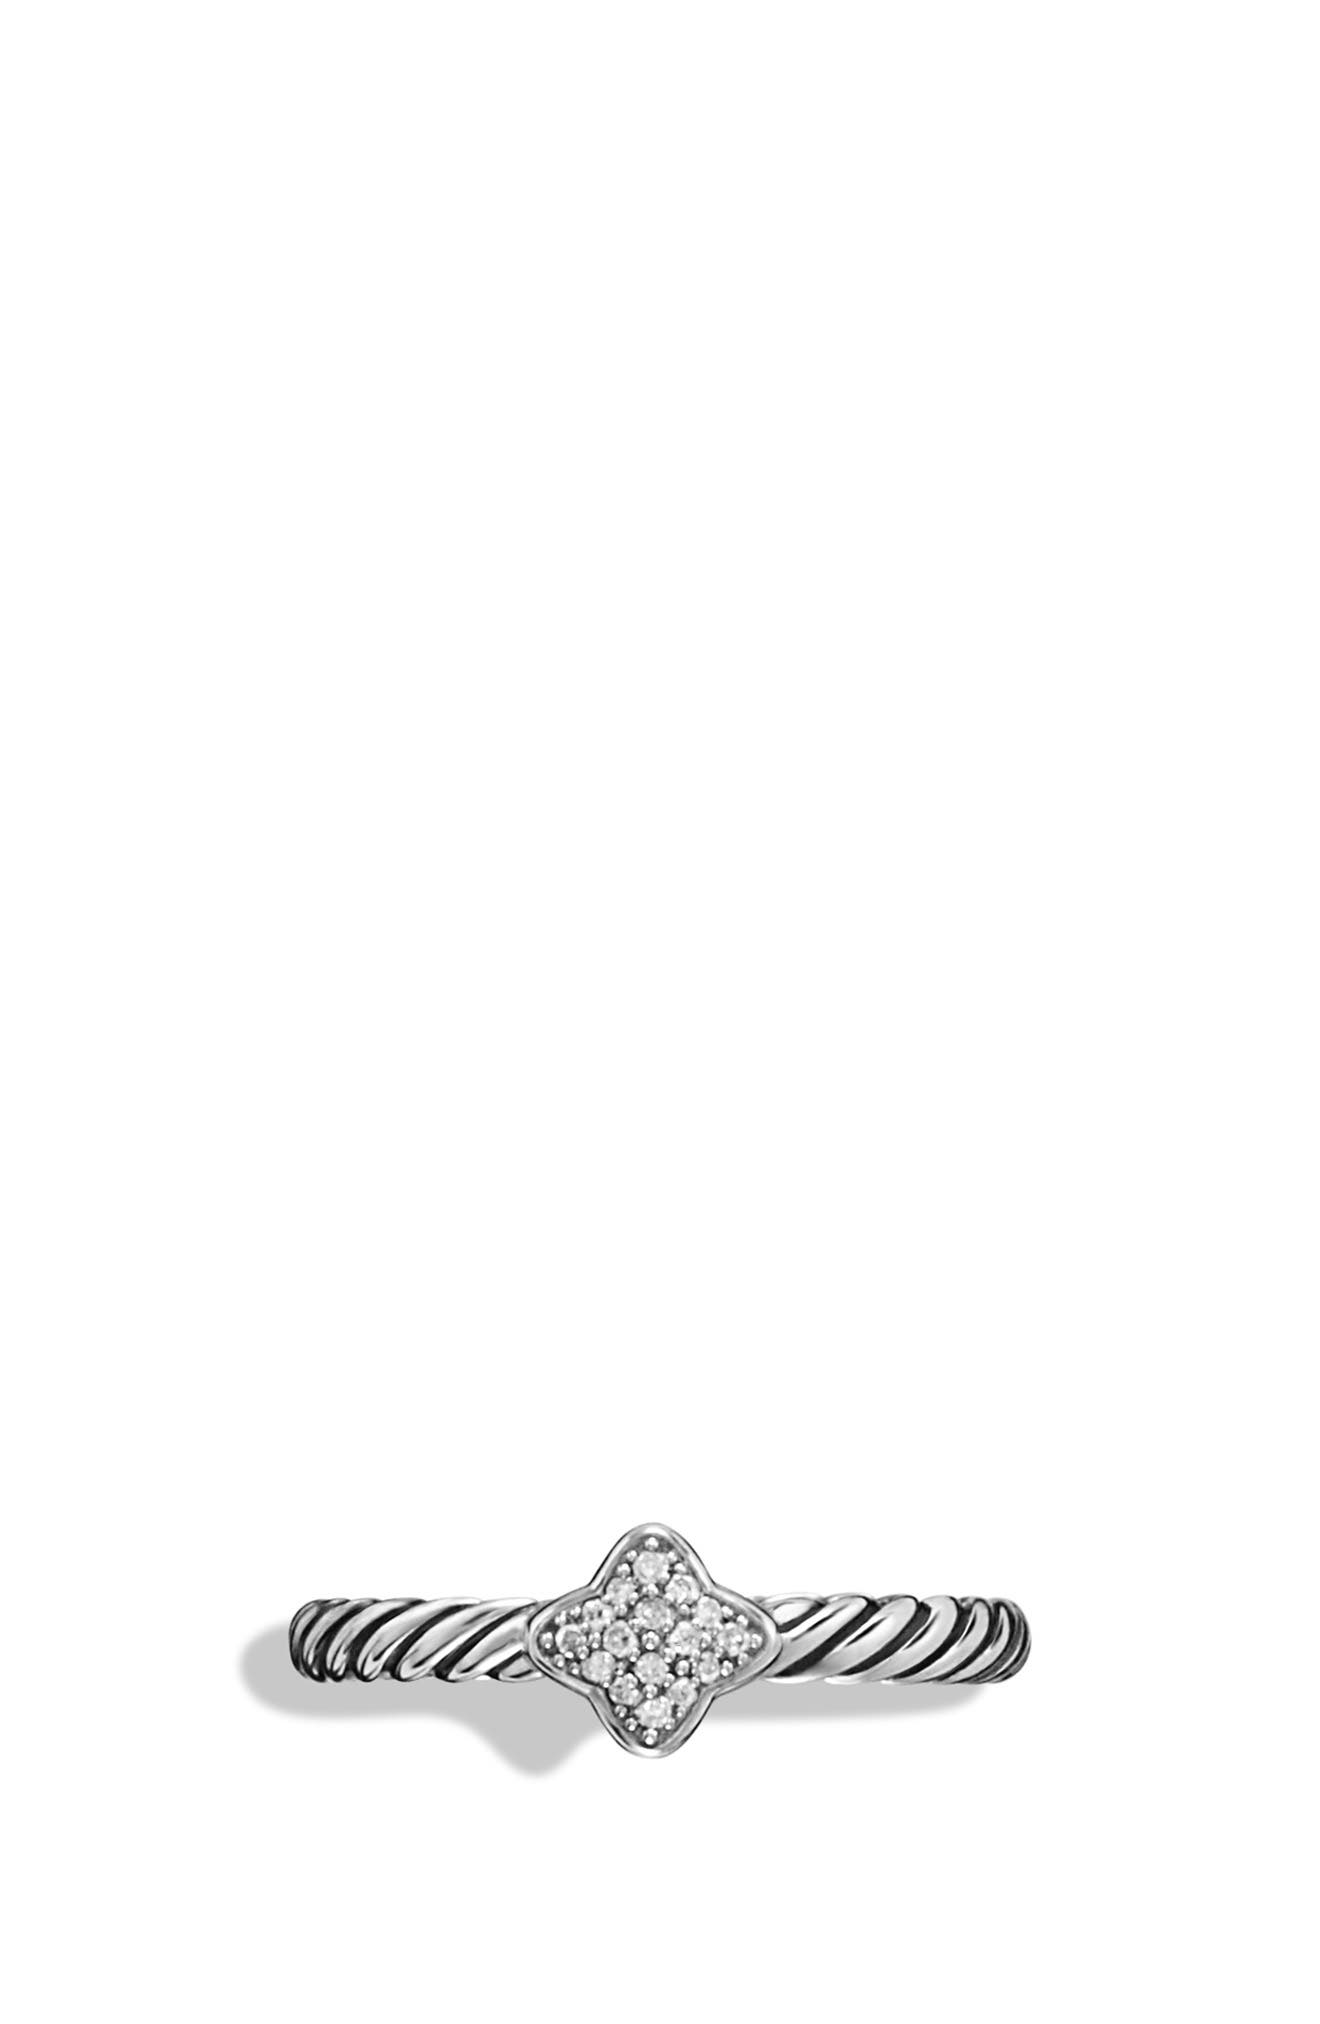 Quatrefoil Ring with Diamonds,                             Alternate thumbnail 3, color,                             100